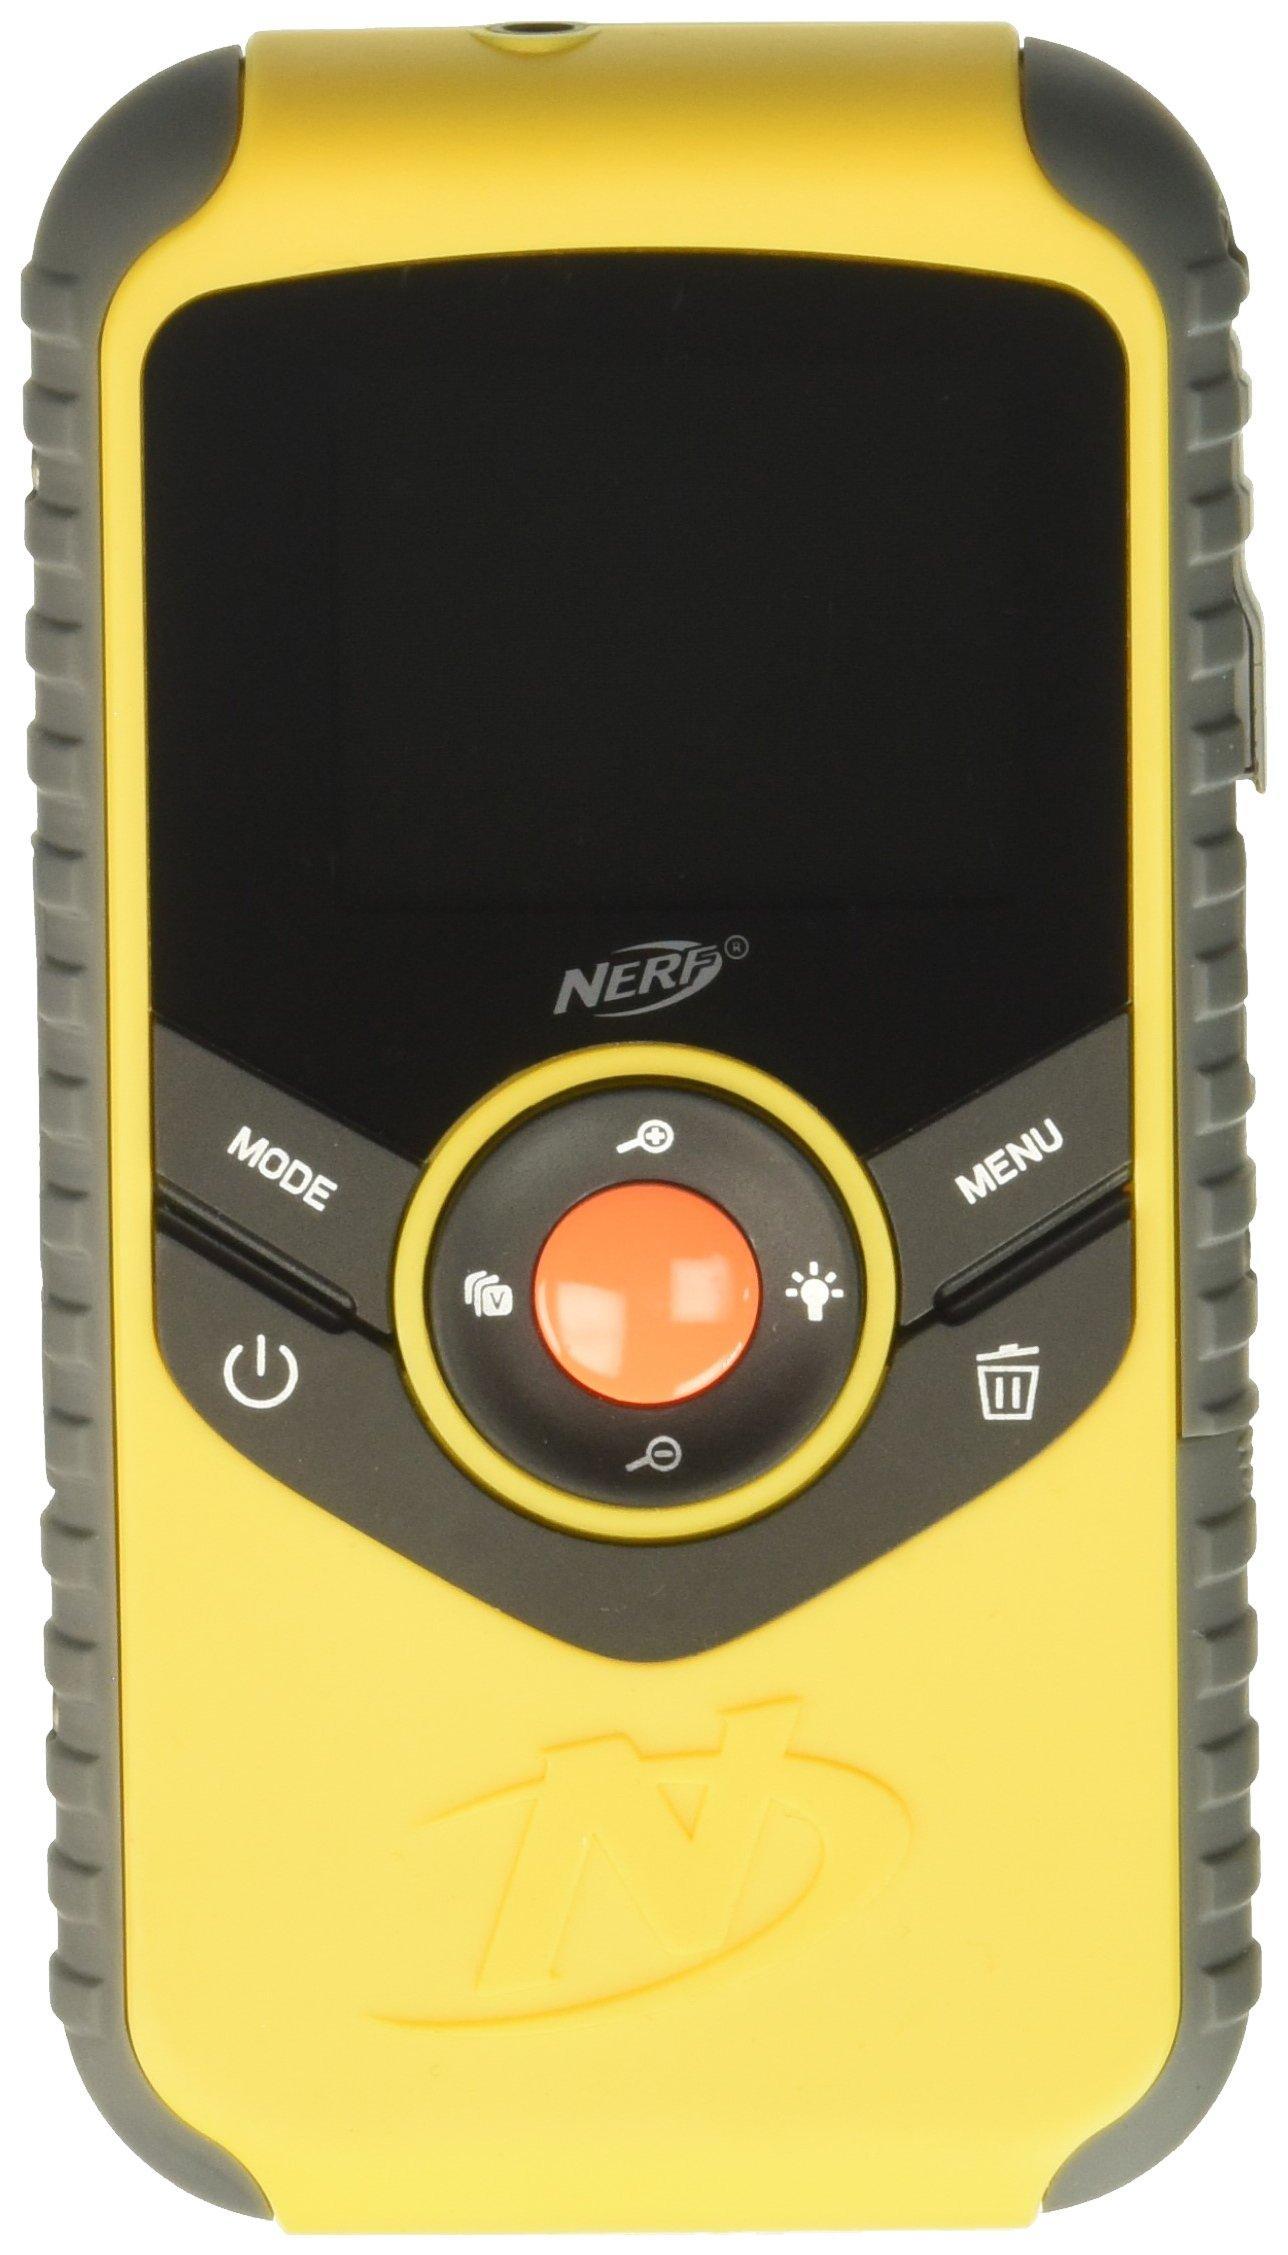 Nerf Pocket Camcorder - Yellow (38056)